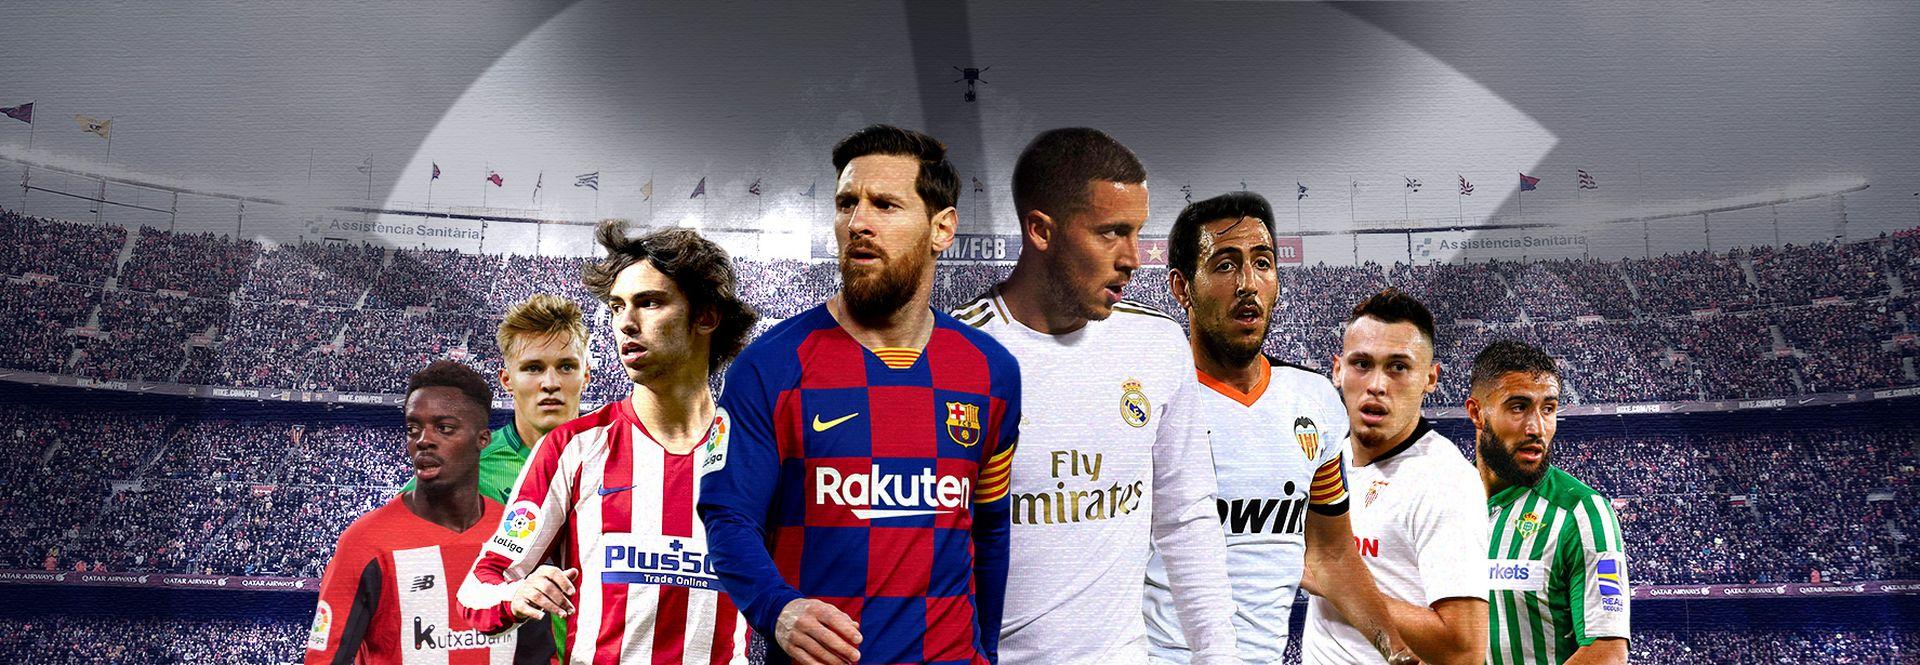 Wraca liga hiszpańska